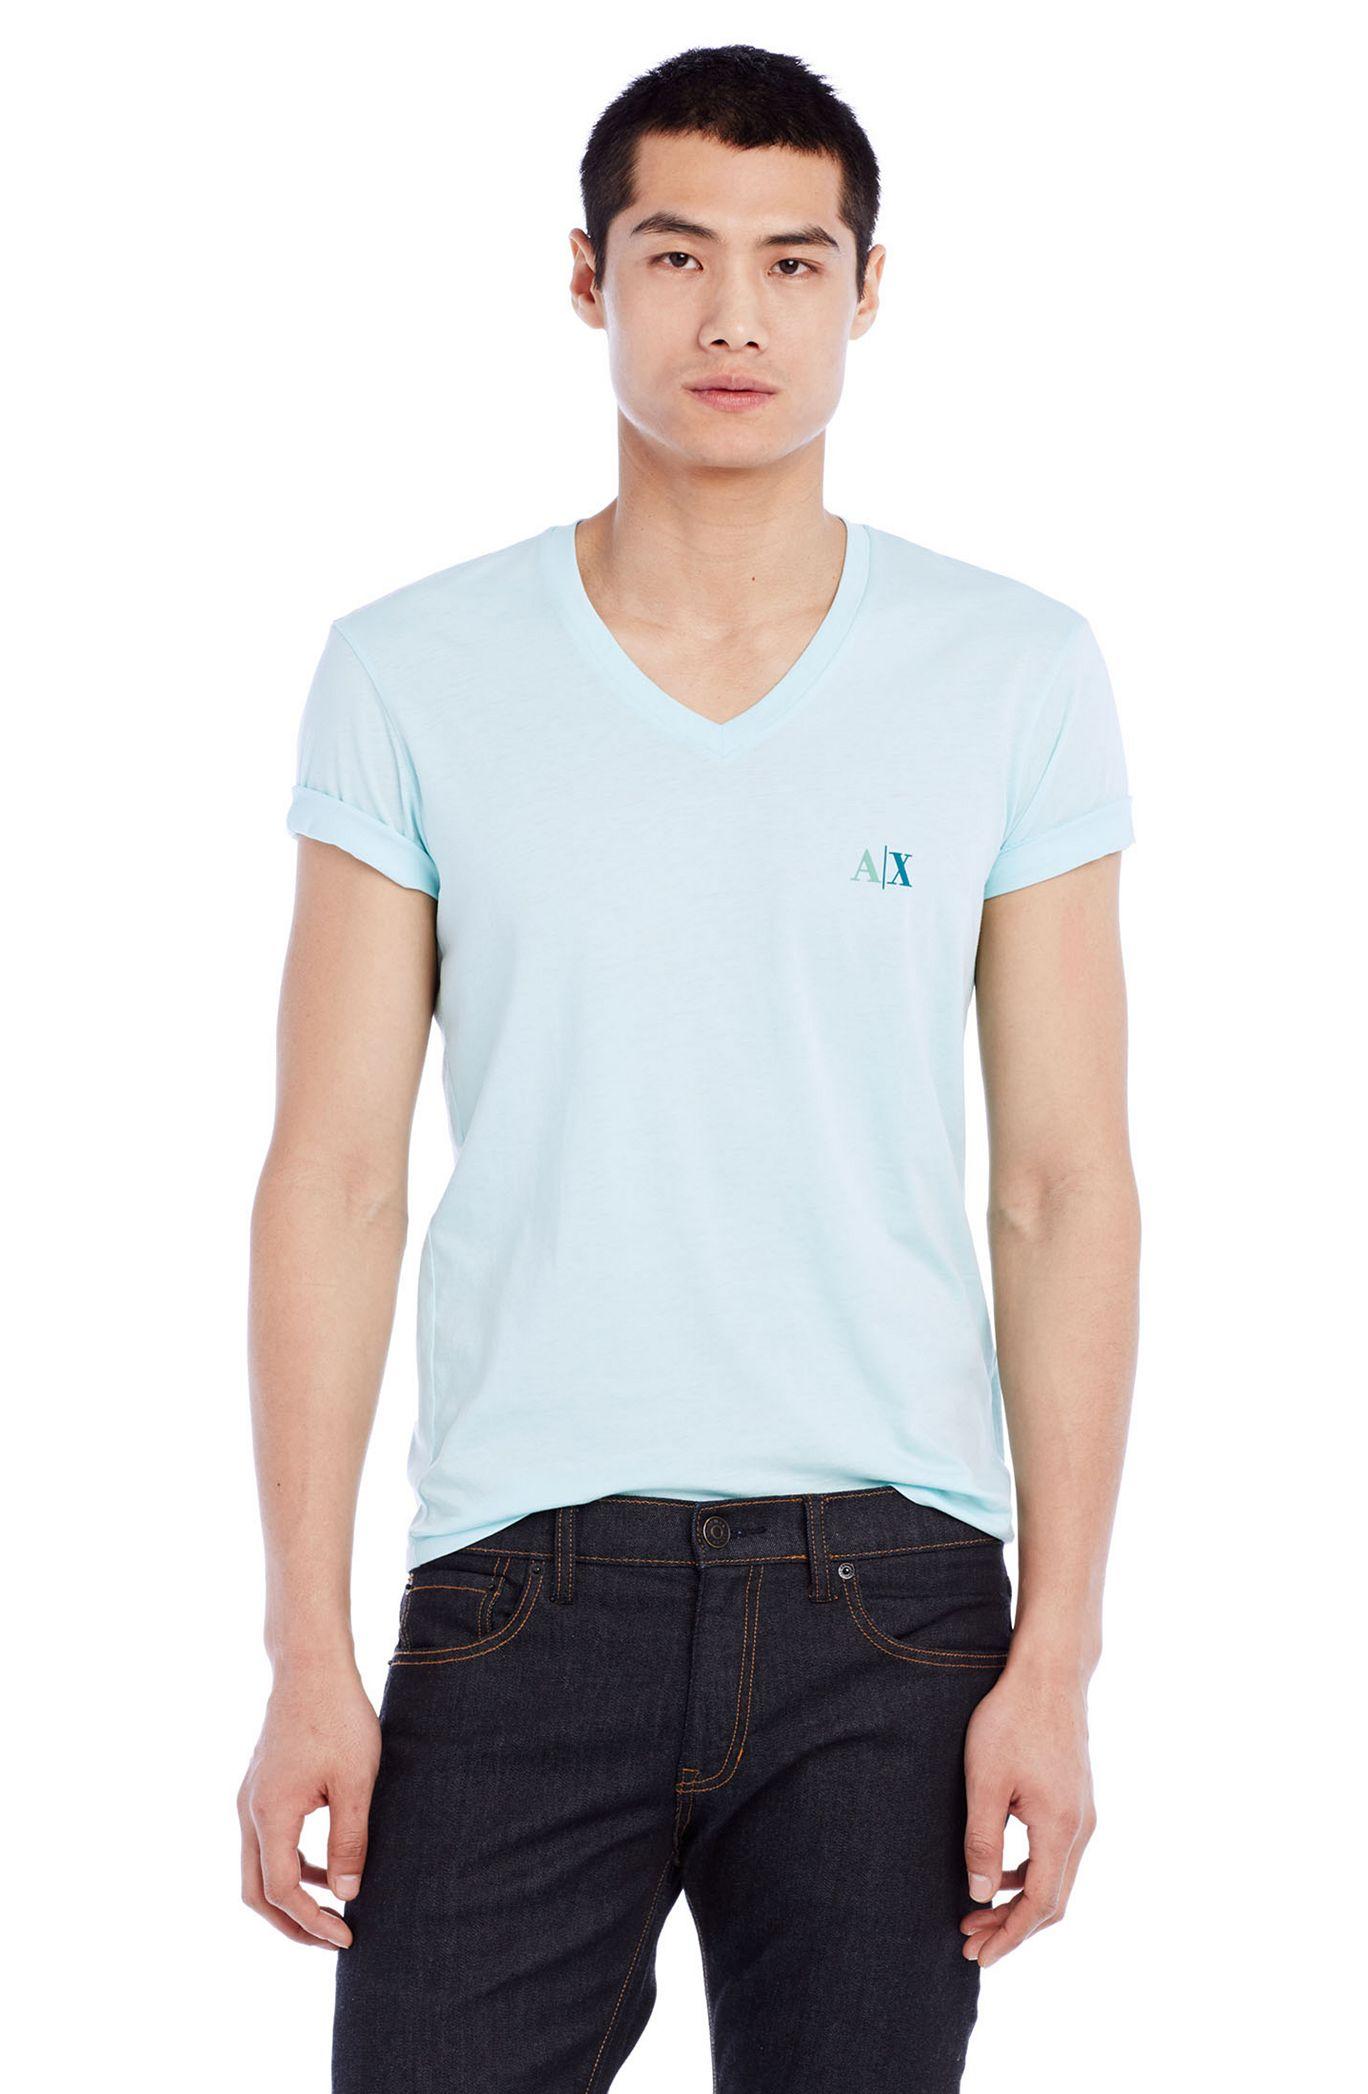 Футболка мужская Armani  2015 AX Exchange женская рубашка armani 85 ax 2015 j5c552